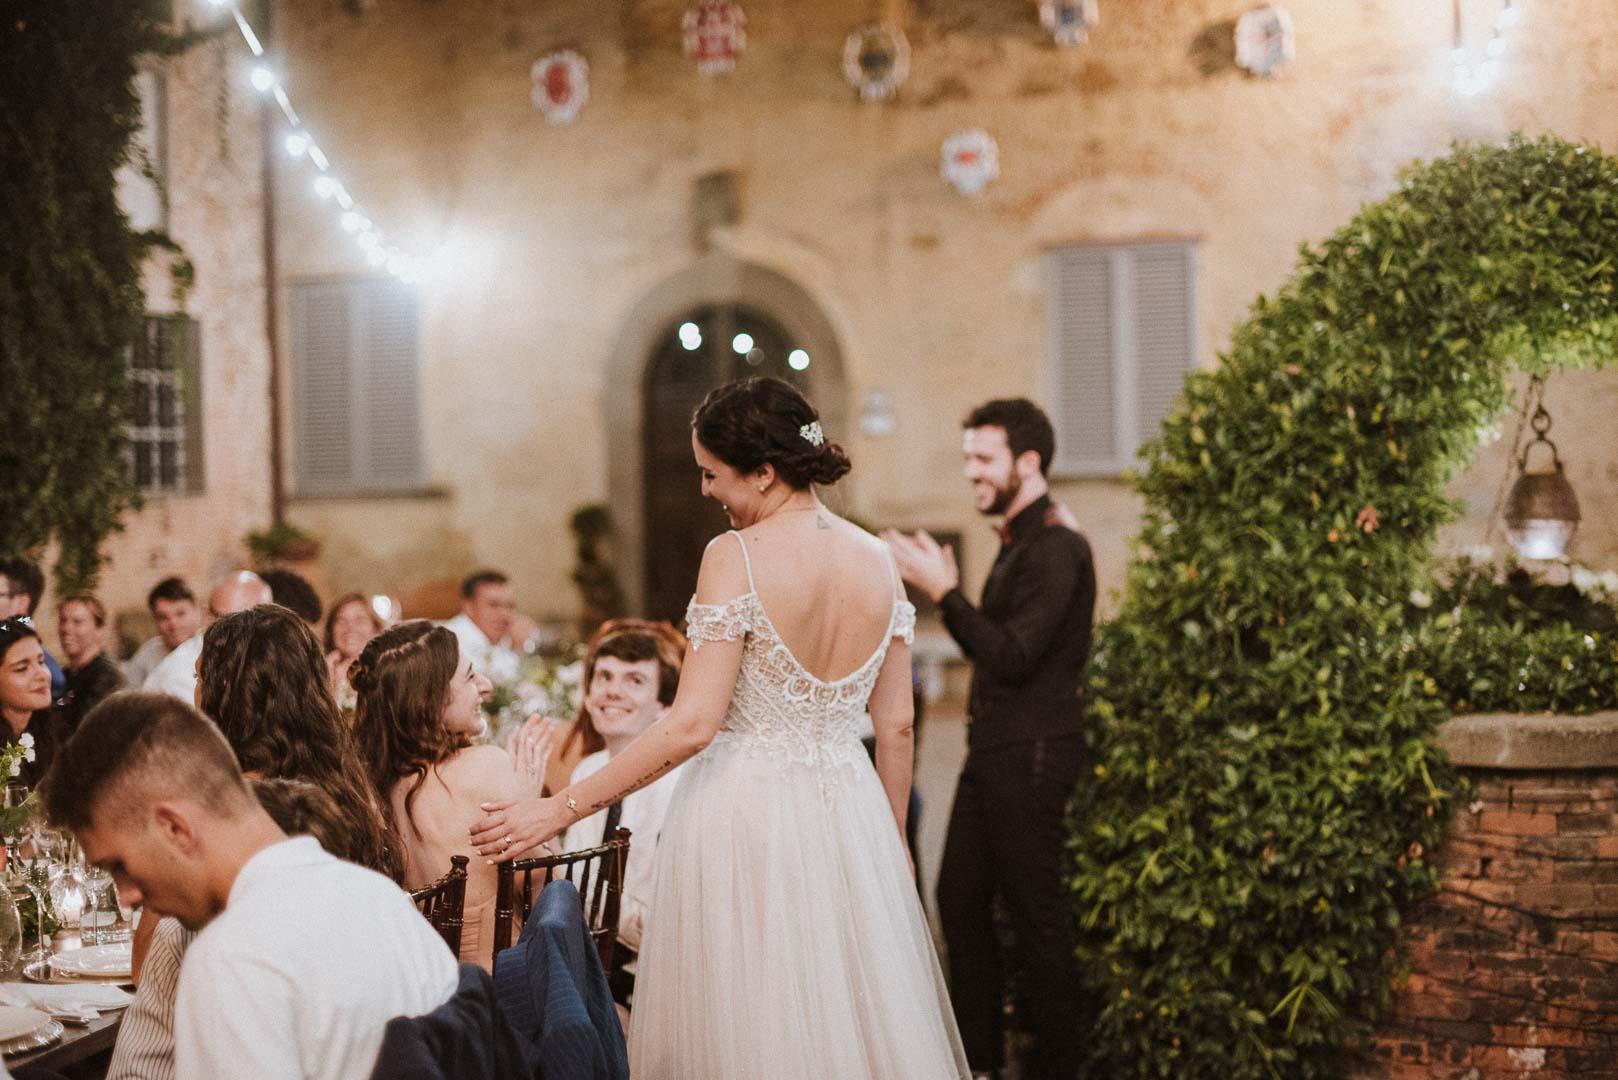 wedding-photographer-destination-fineart-bespoke-reportage-tuscany-villascorzi-vivianeizzo-spazio46-173